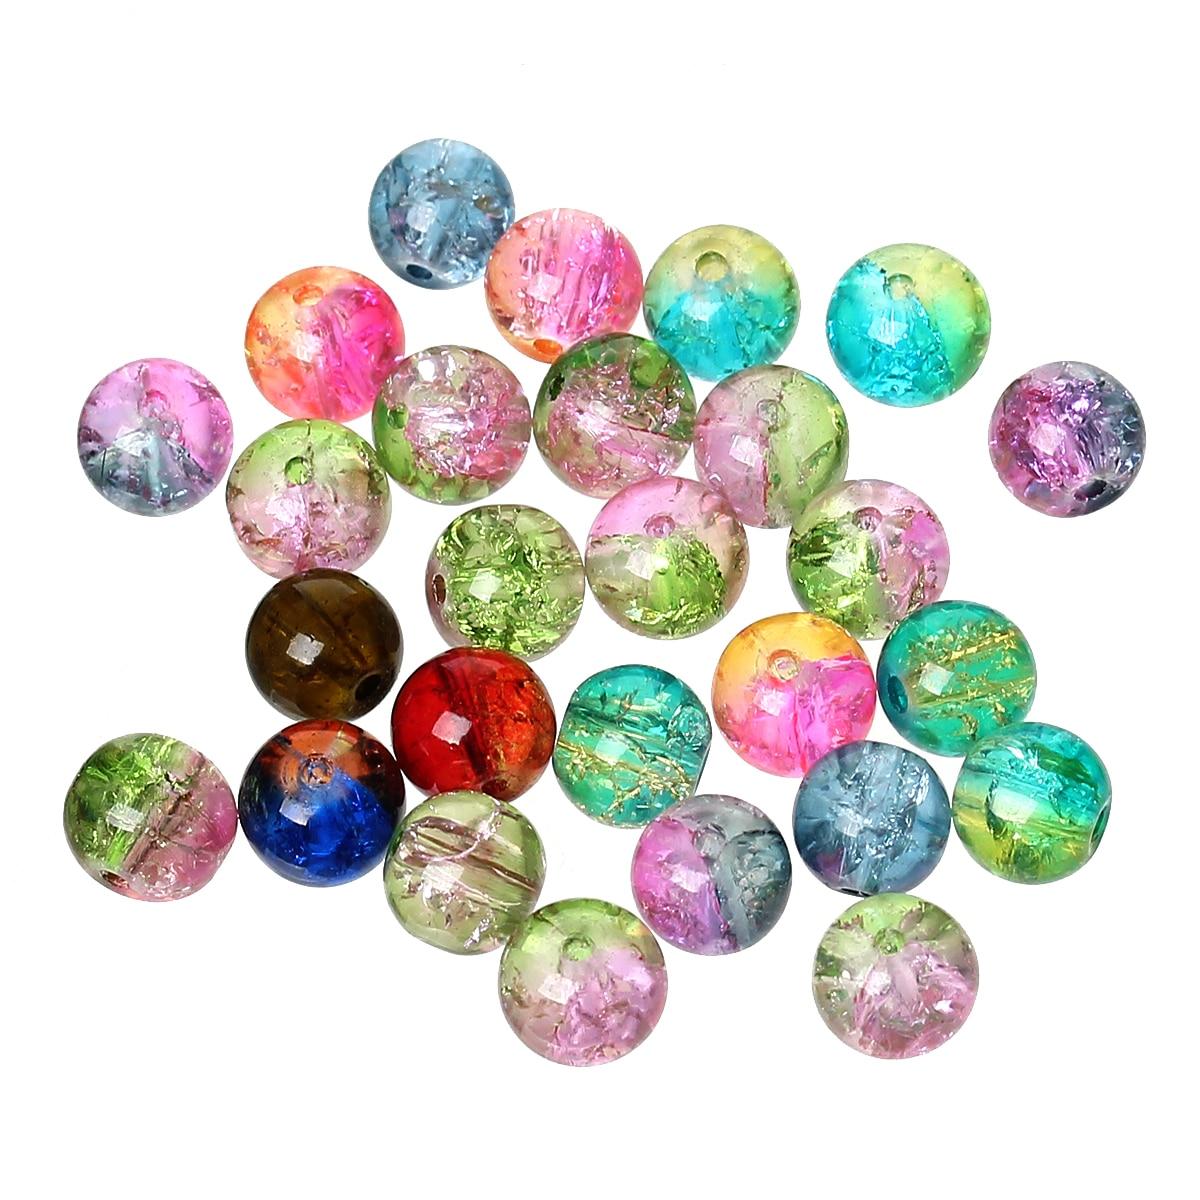 Prix pour DoreenBeads 500 Mixte Crackle Verre Perles Rondes 8mm Dia. (B05641), yiwu